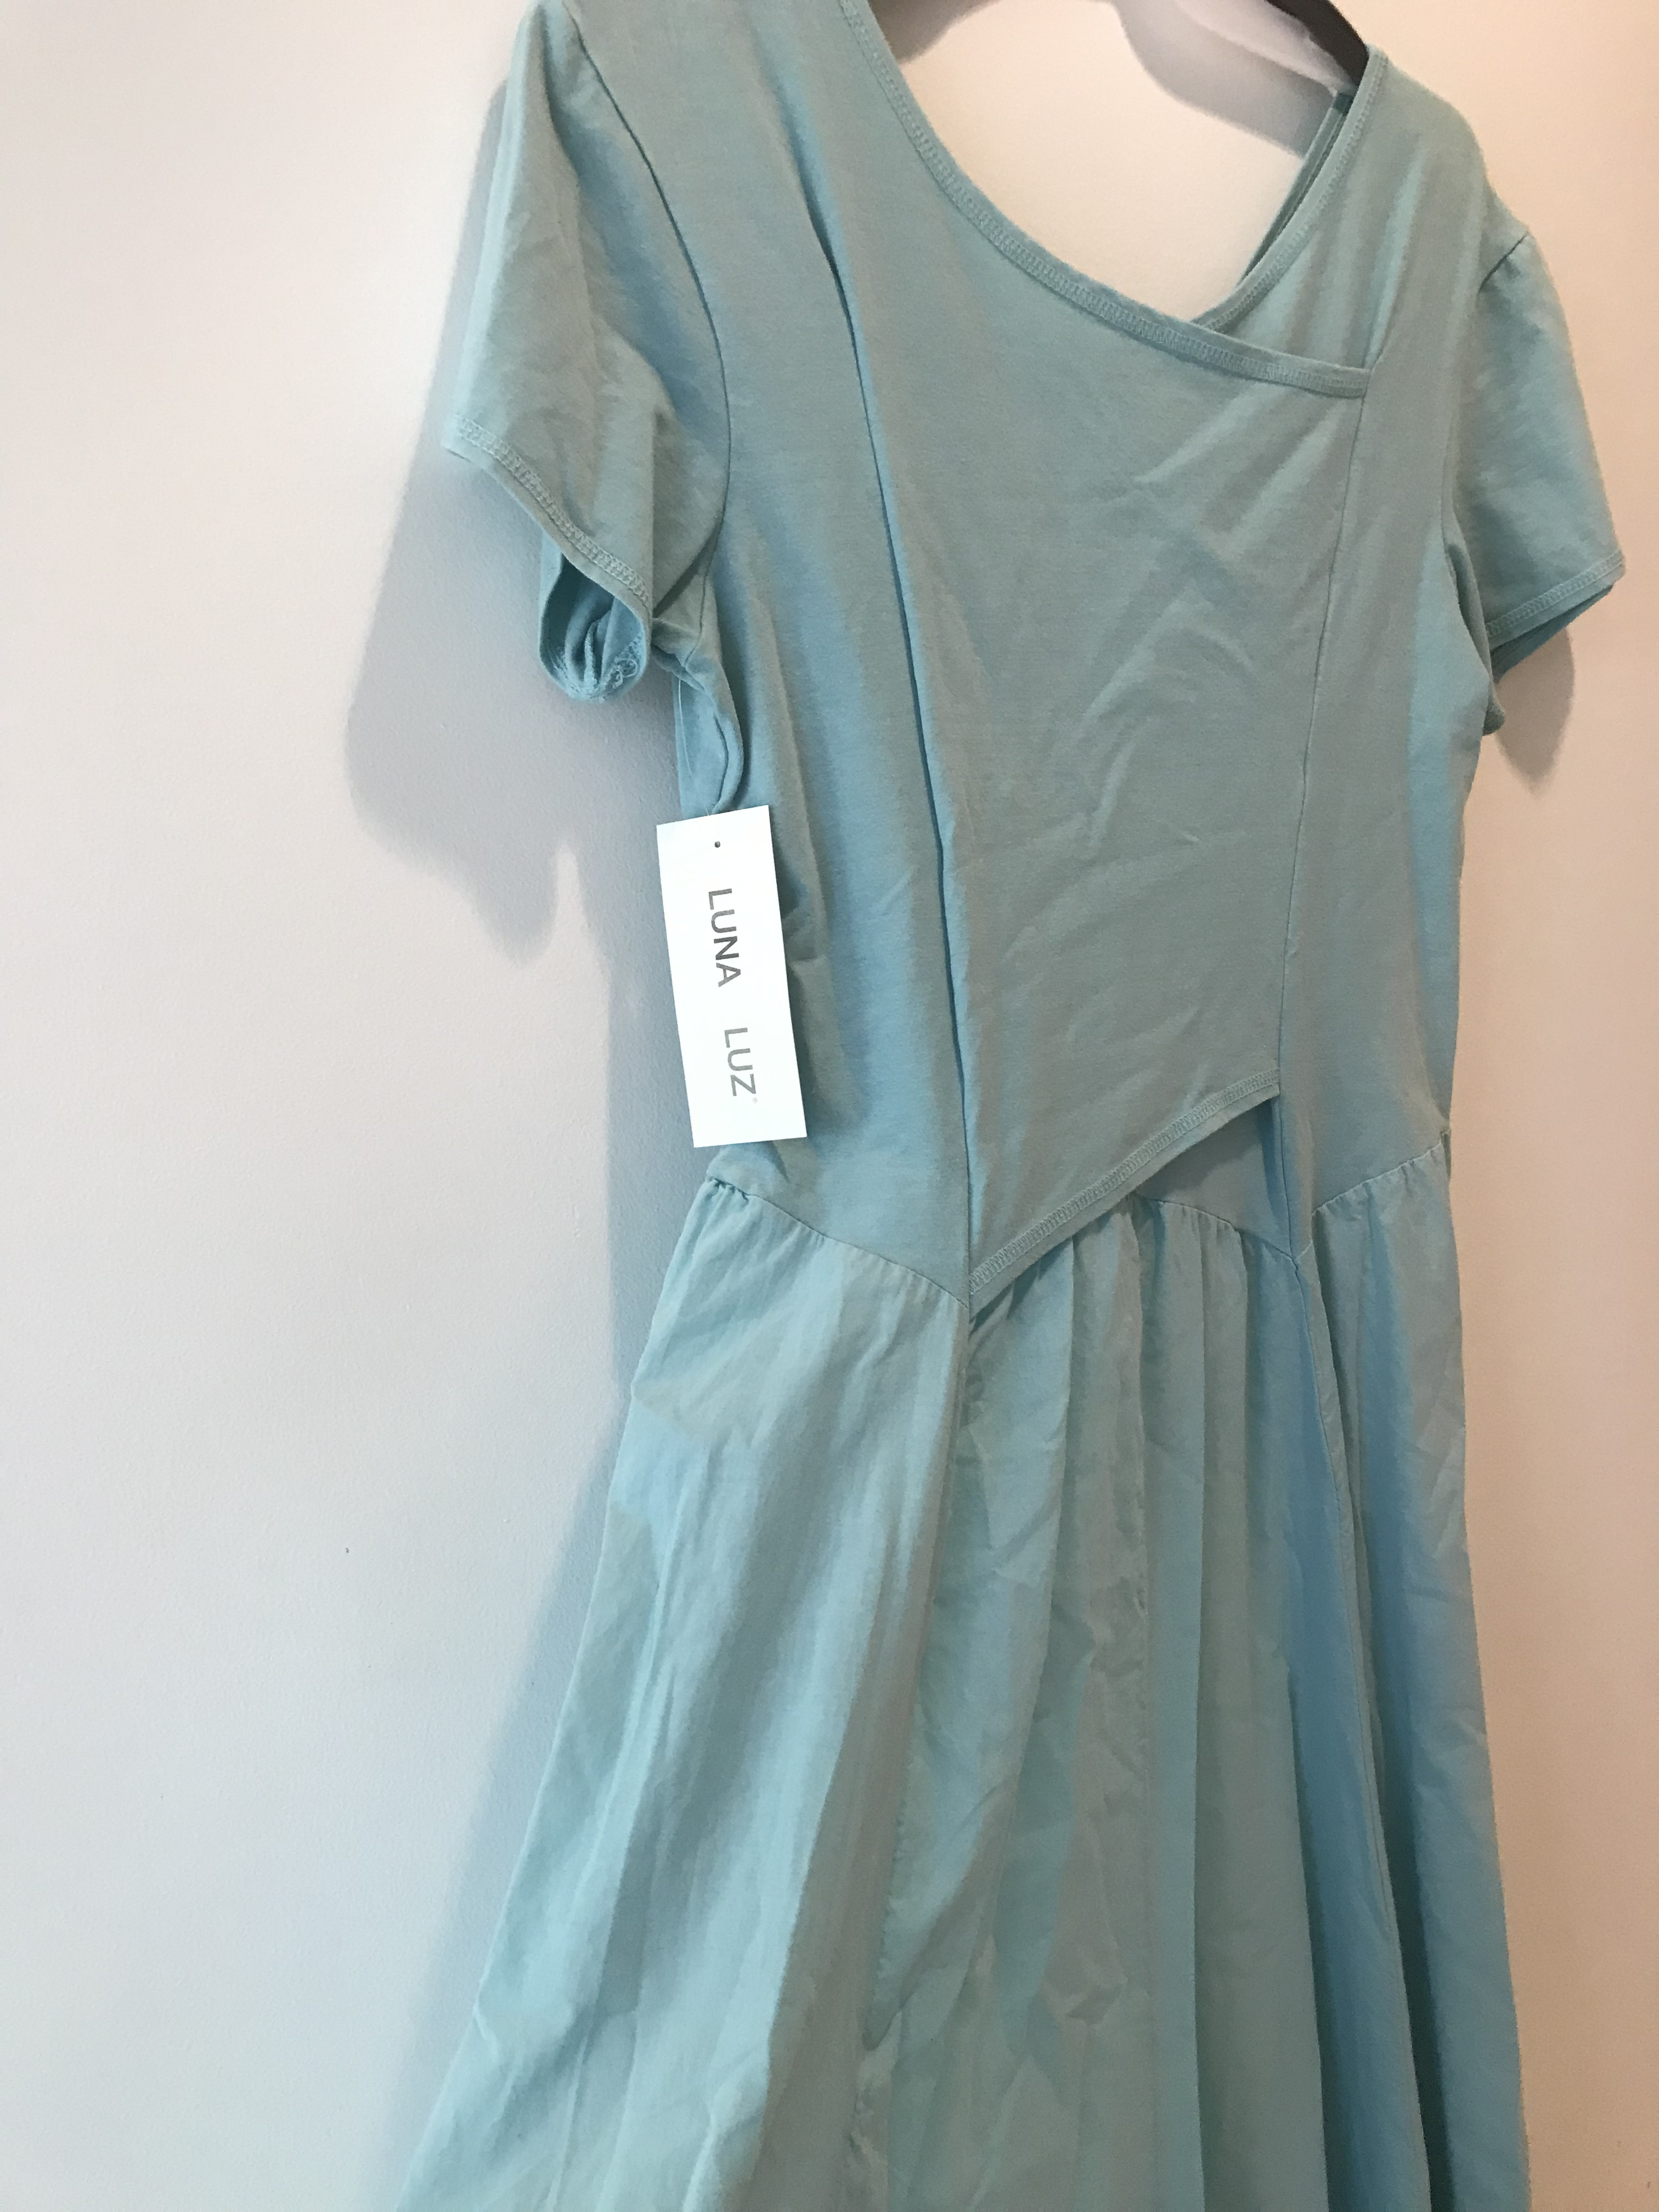 Luna Luz: Short Sleeve Cross Over Bodice Long Dress (Ships Immed in Angel Blue, 2 Left!)